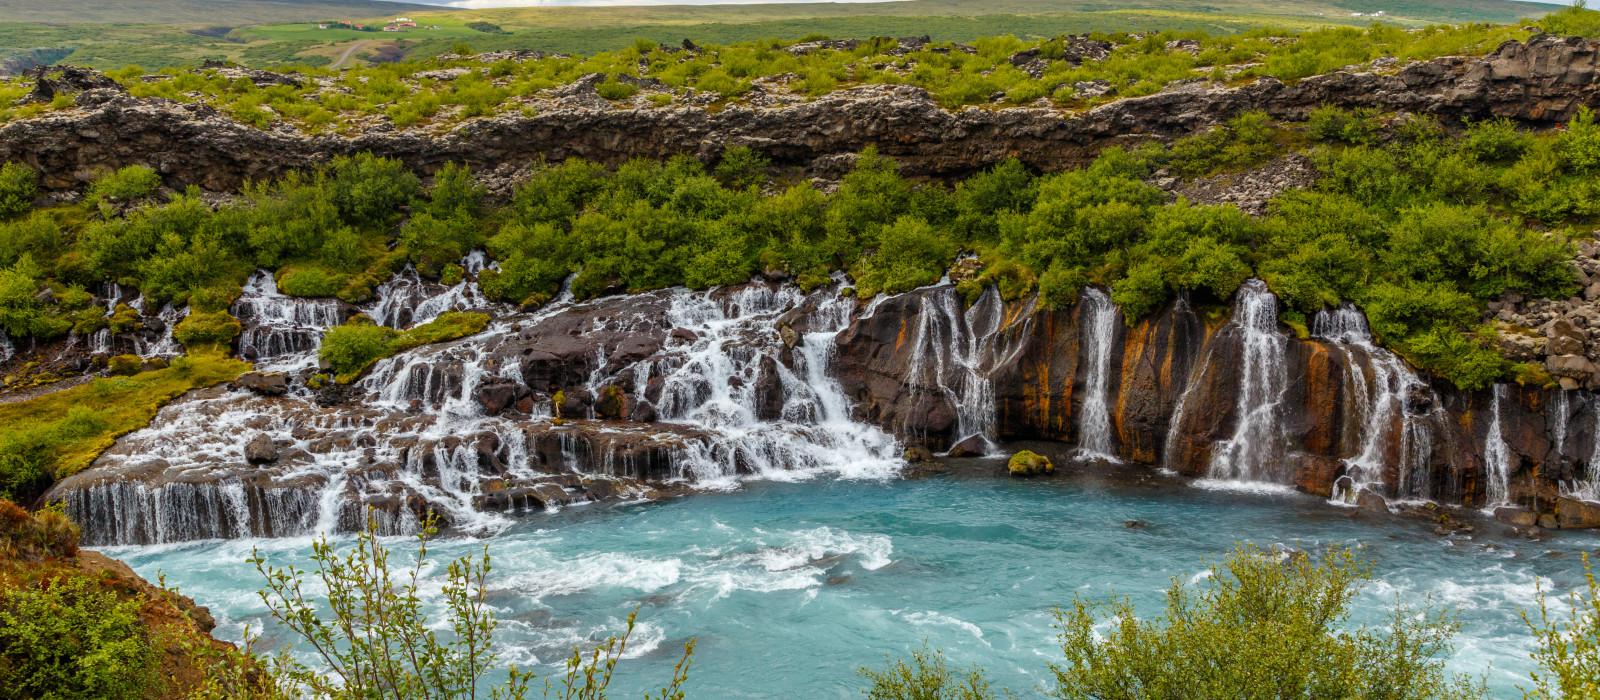 Destination Húsafell Iceland